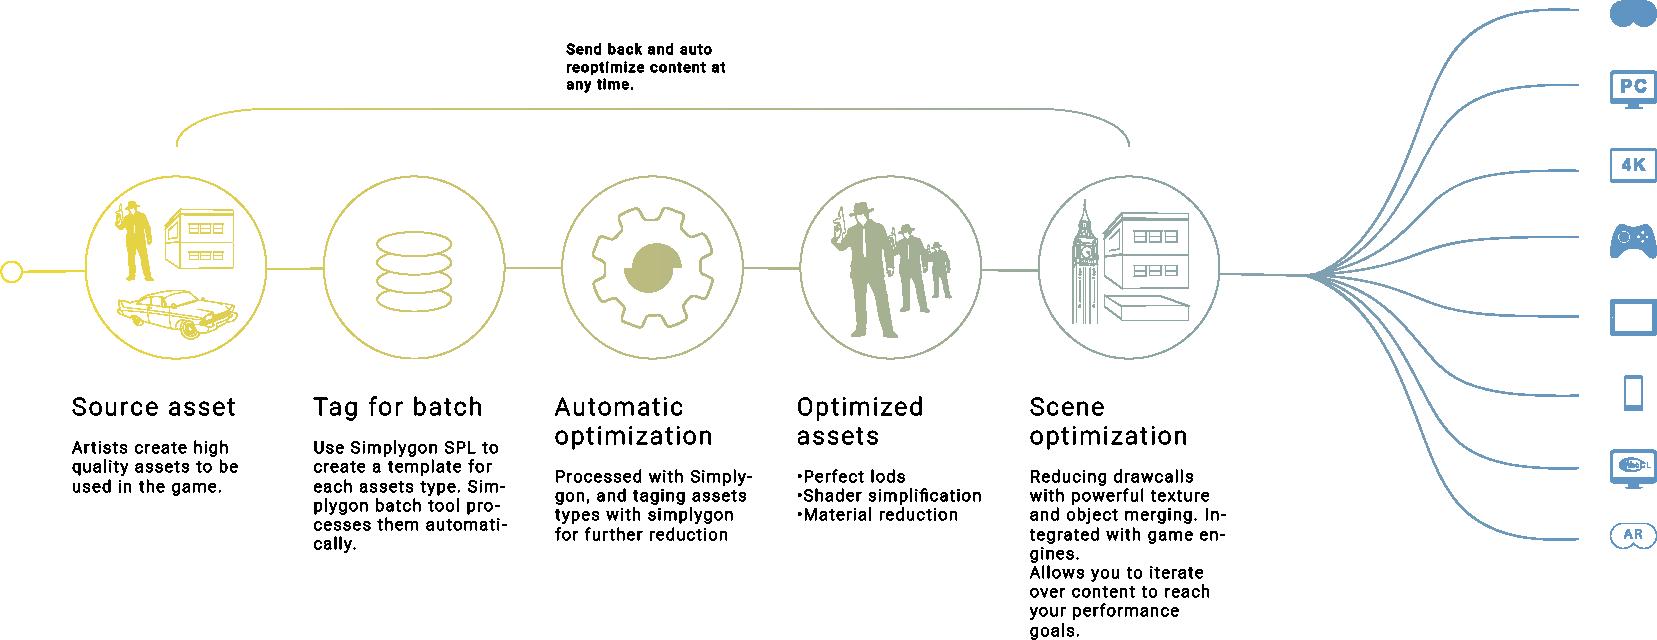 The Simplygon development pipeline. Image via Simplygon.